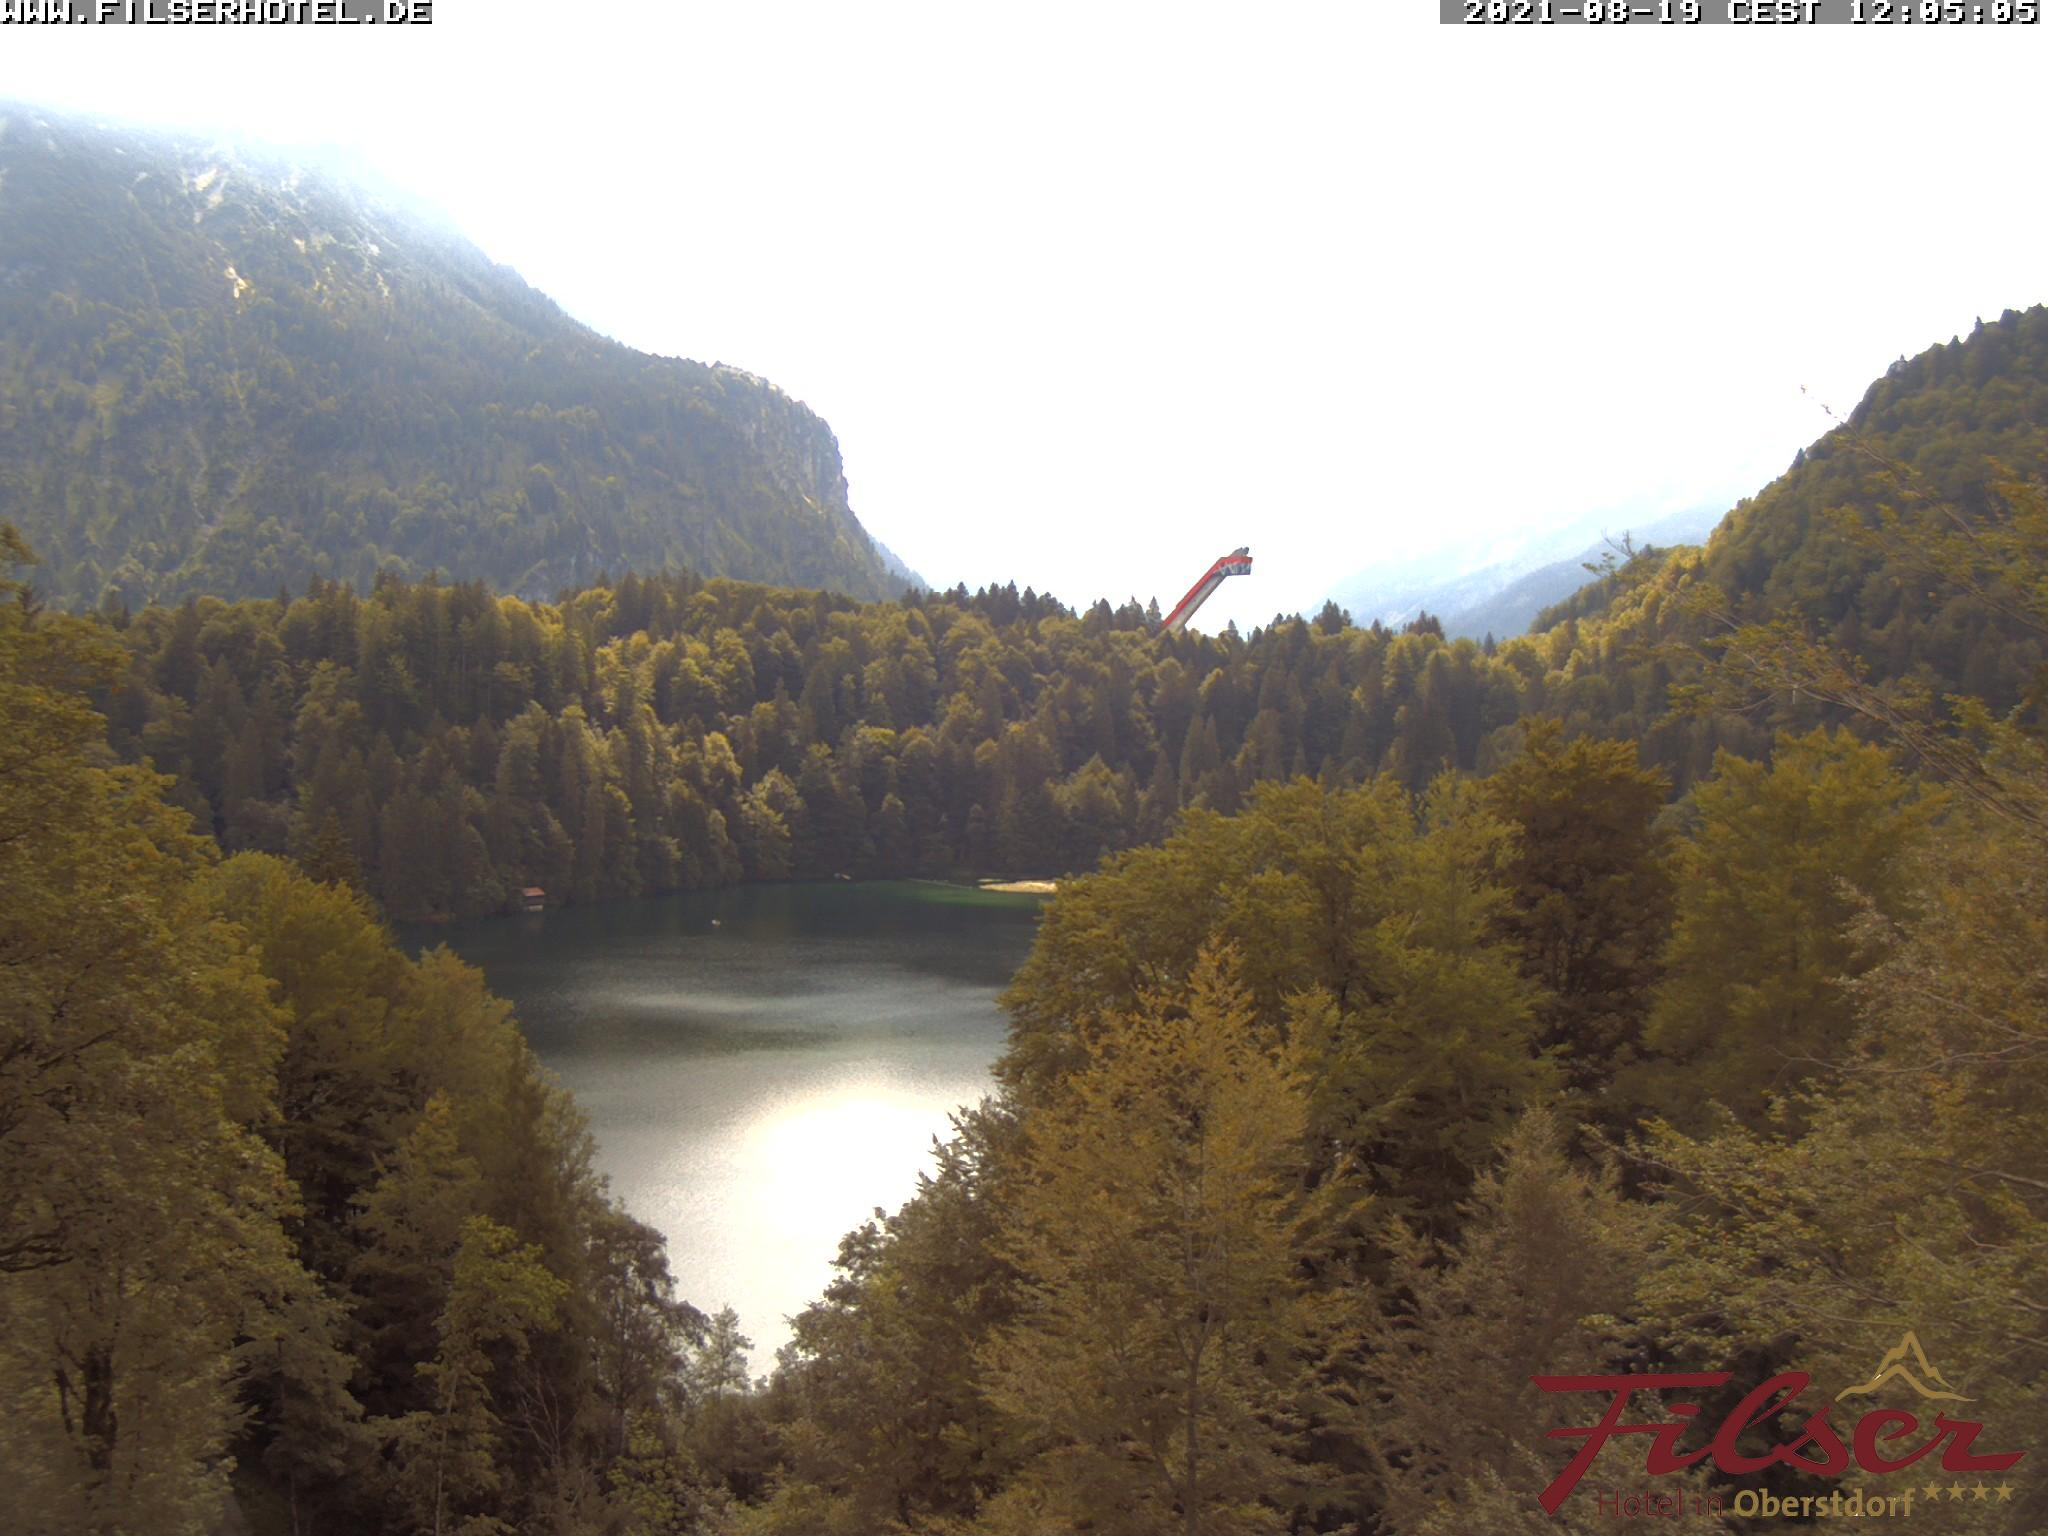 Webcam Freibergsee, Hotel Filser